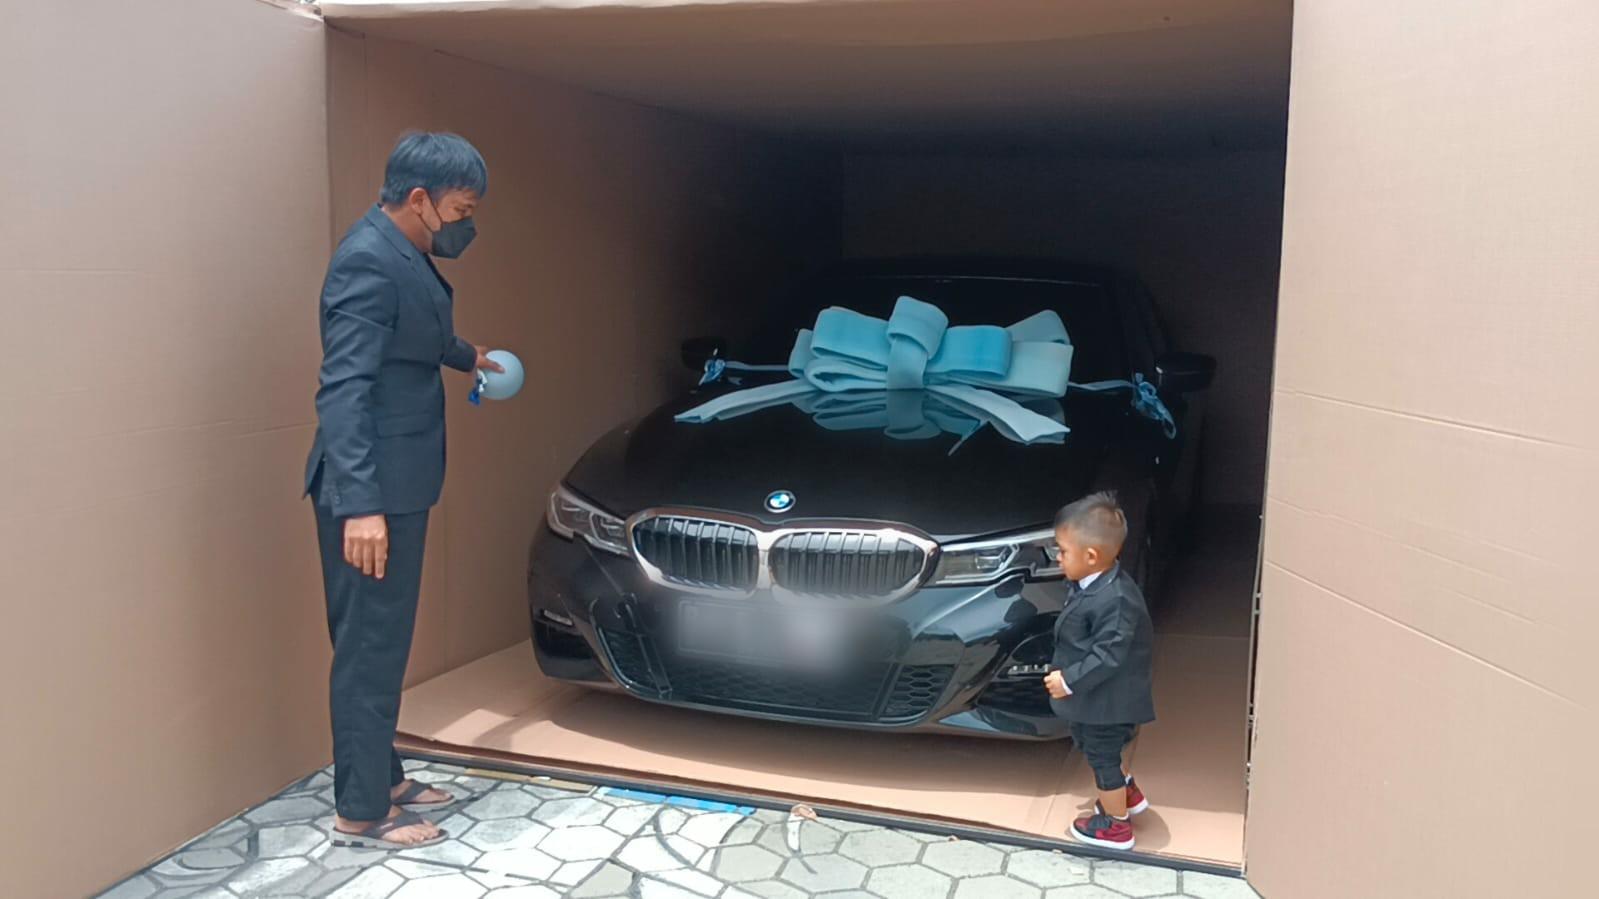 Satu unit mobil mewah seharga Rp1,3 Miliar yang dihadiahkan untuk anaknya, bernama Adli Alfarizi, putera pengusaha ekspedisi,Wahyu Kandacong yang tinggal di Kota Tangerang.